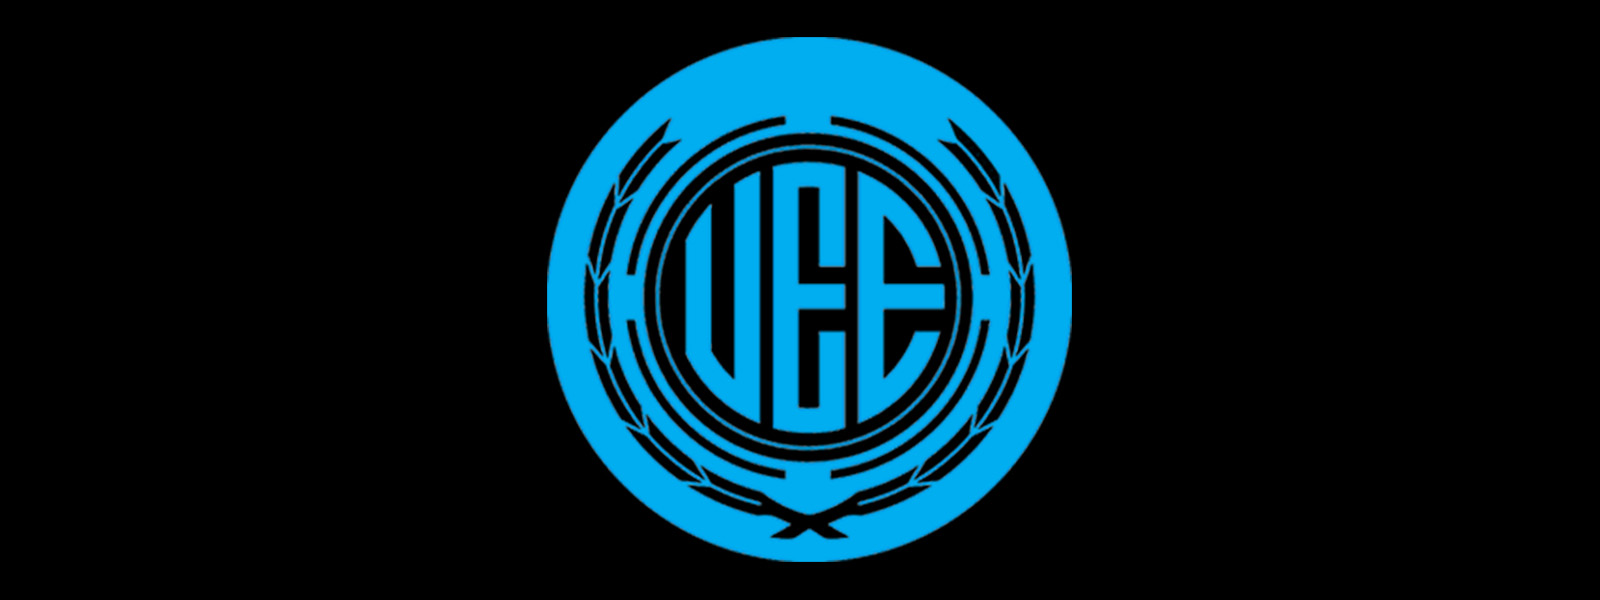 Logos-Resize-1600x600_0000_UEC.jpg